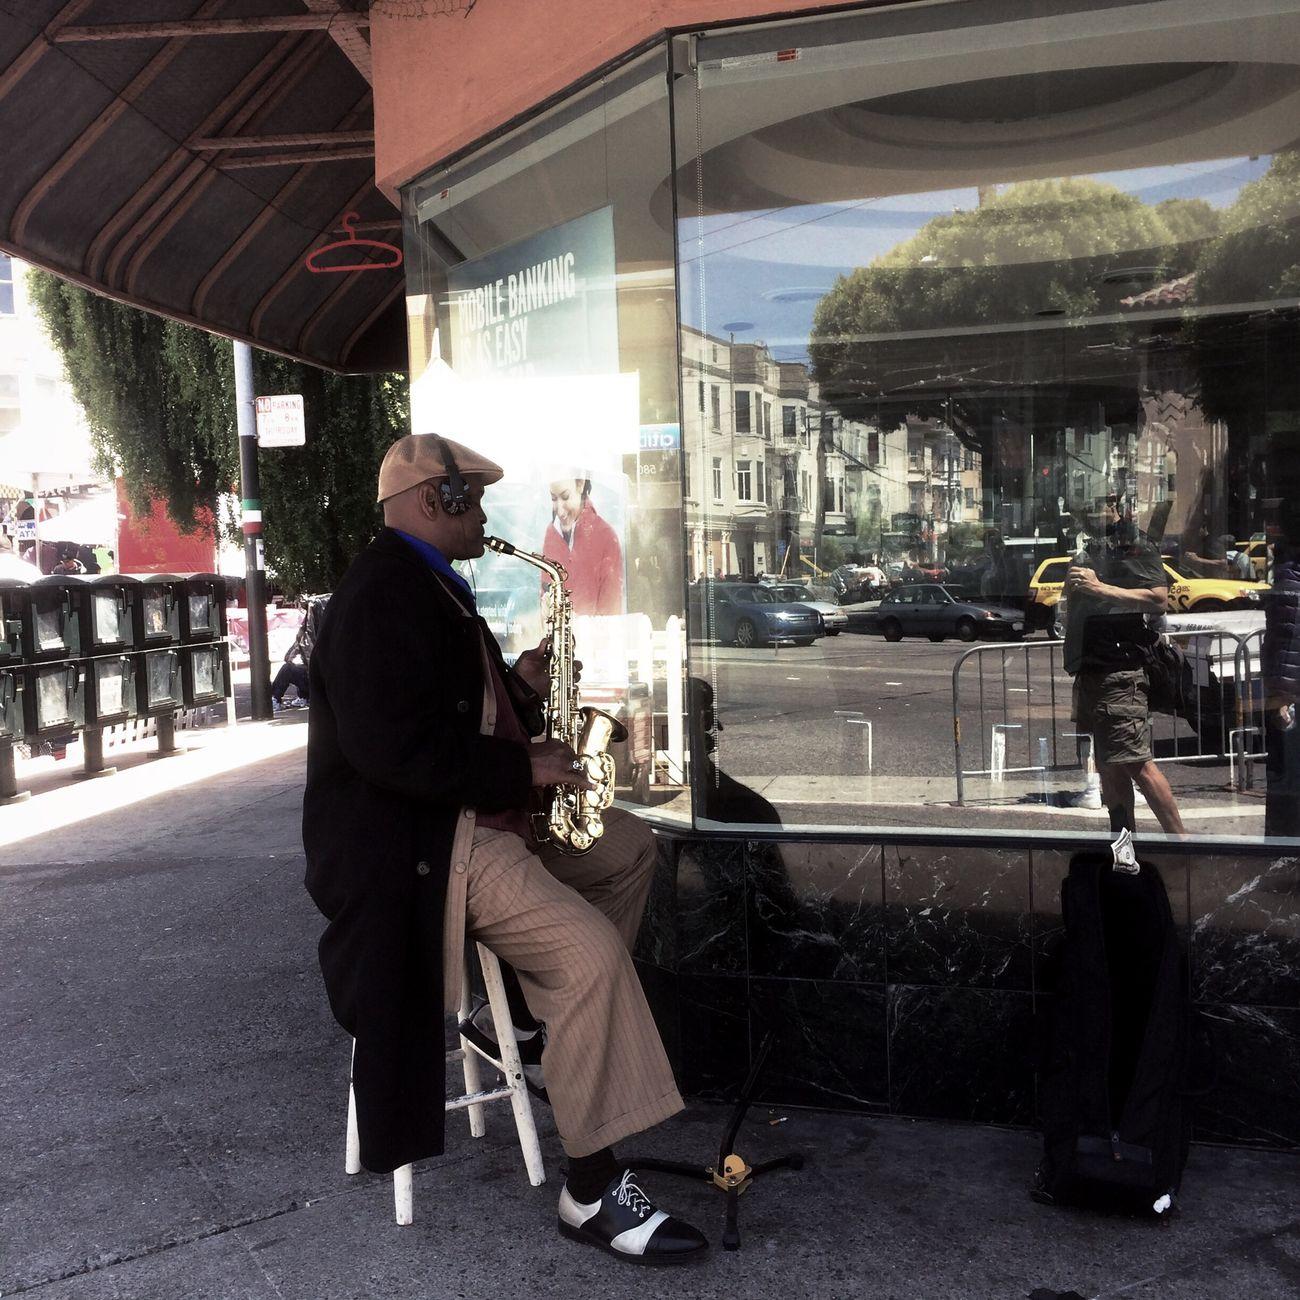 Street saxophonist at North Beach Festival.